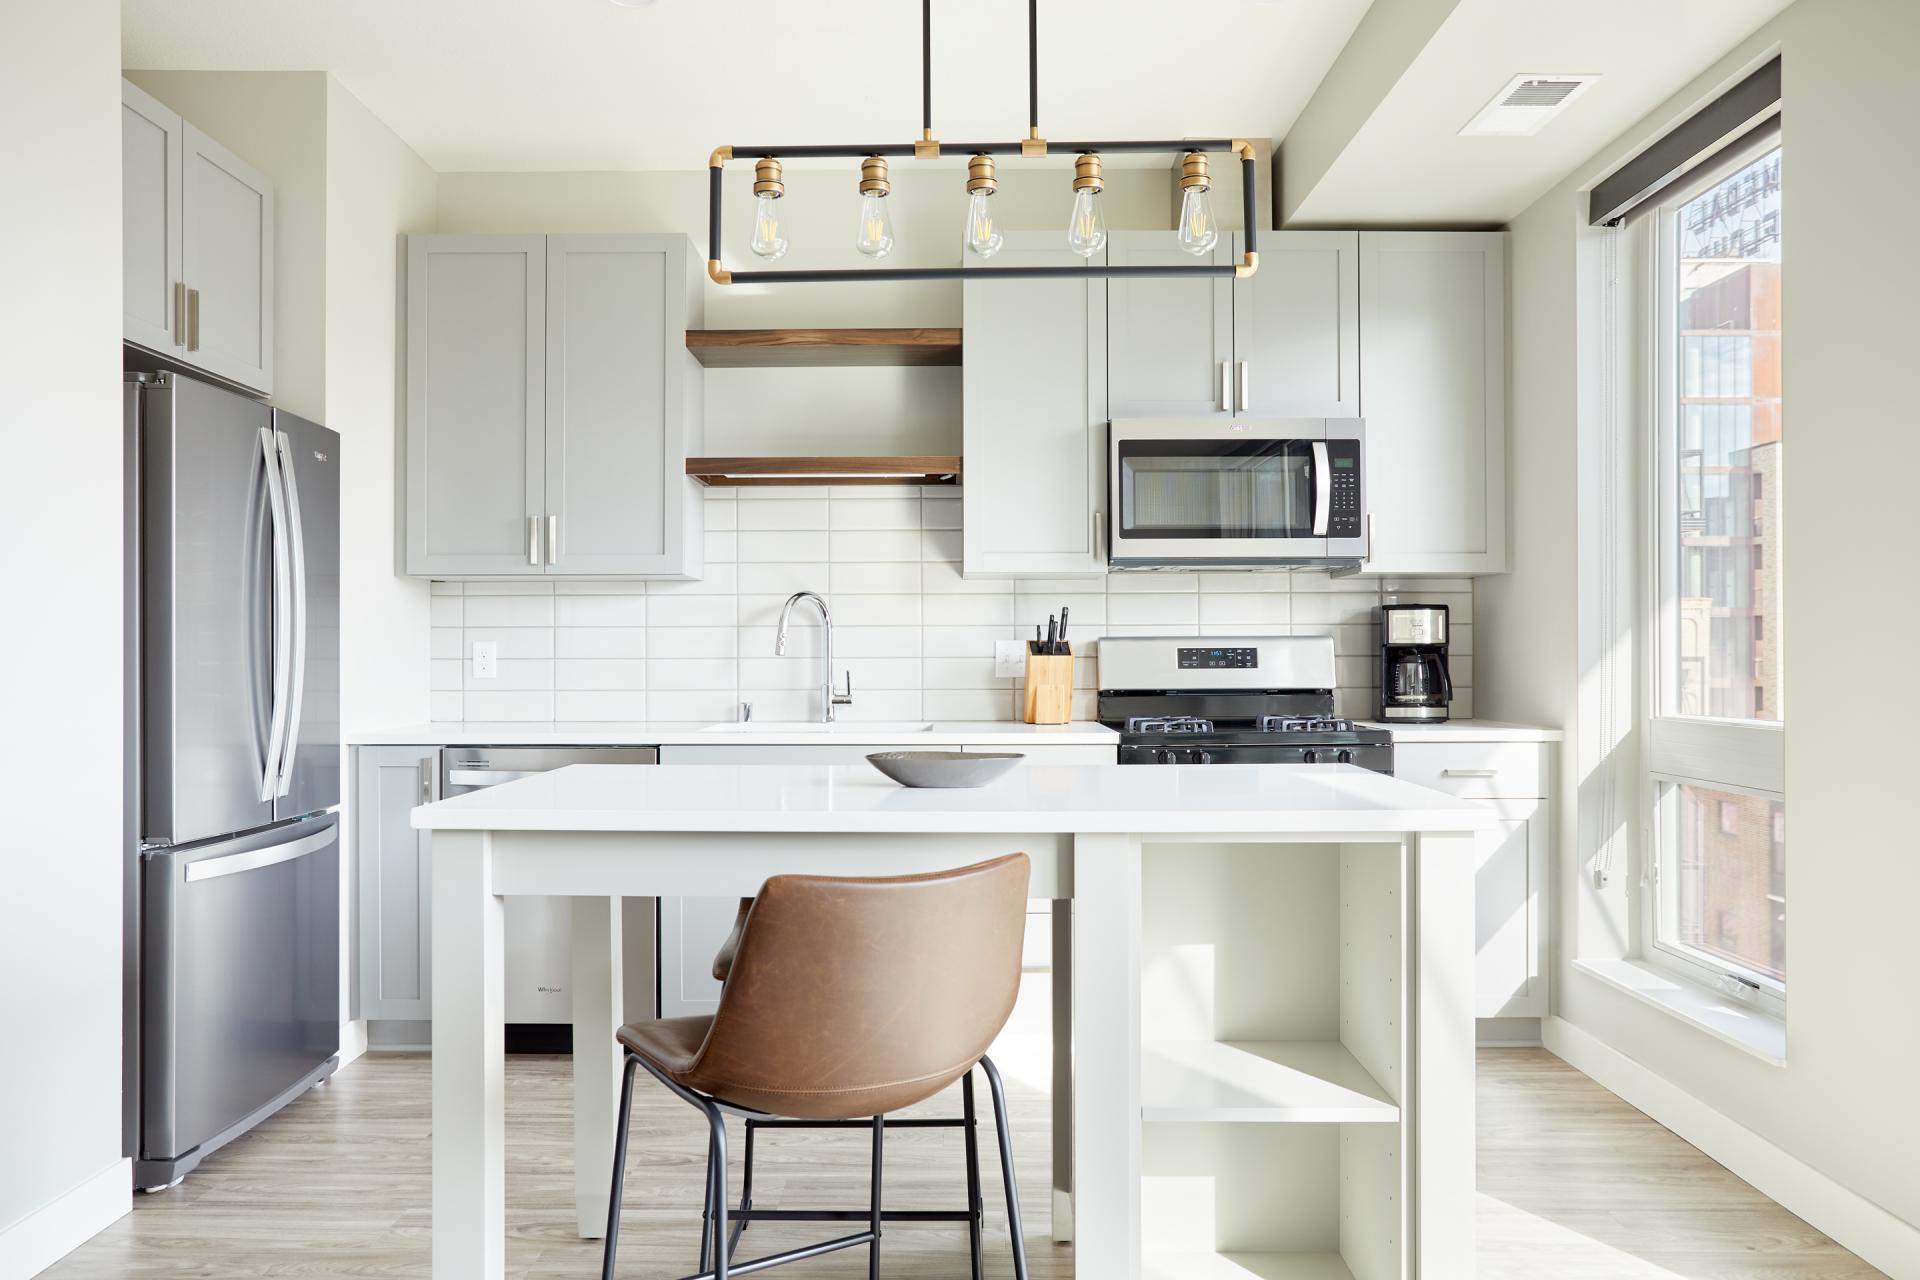 Kitchen at Vicinity Apartments, Centre, Minneapolis